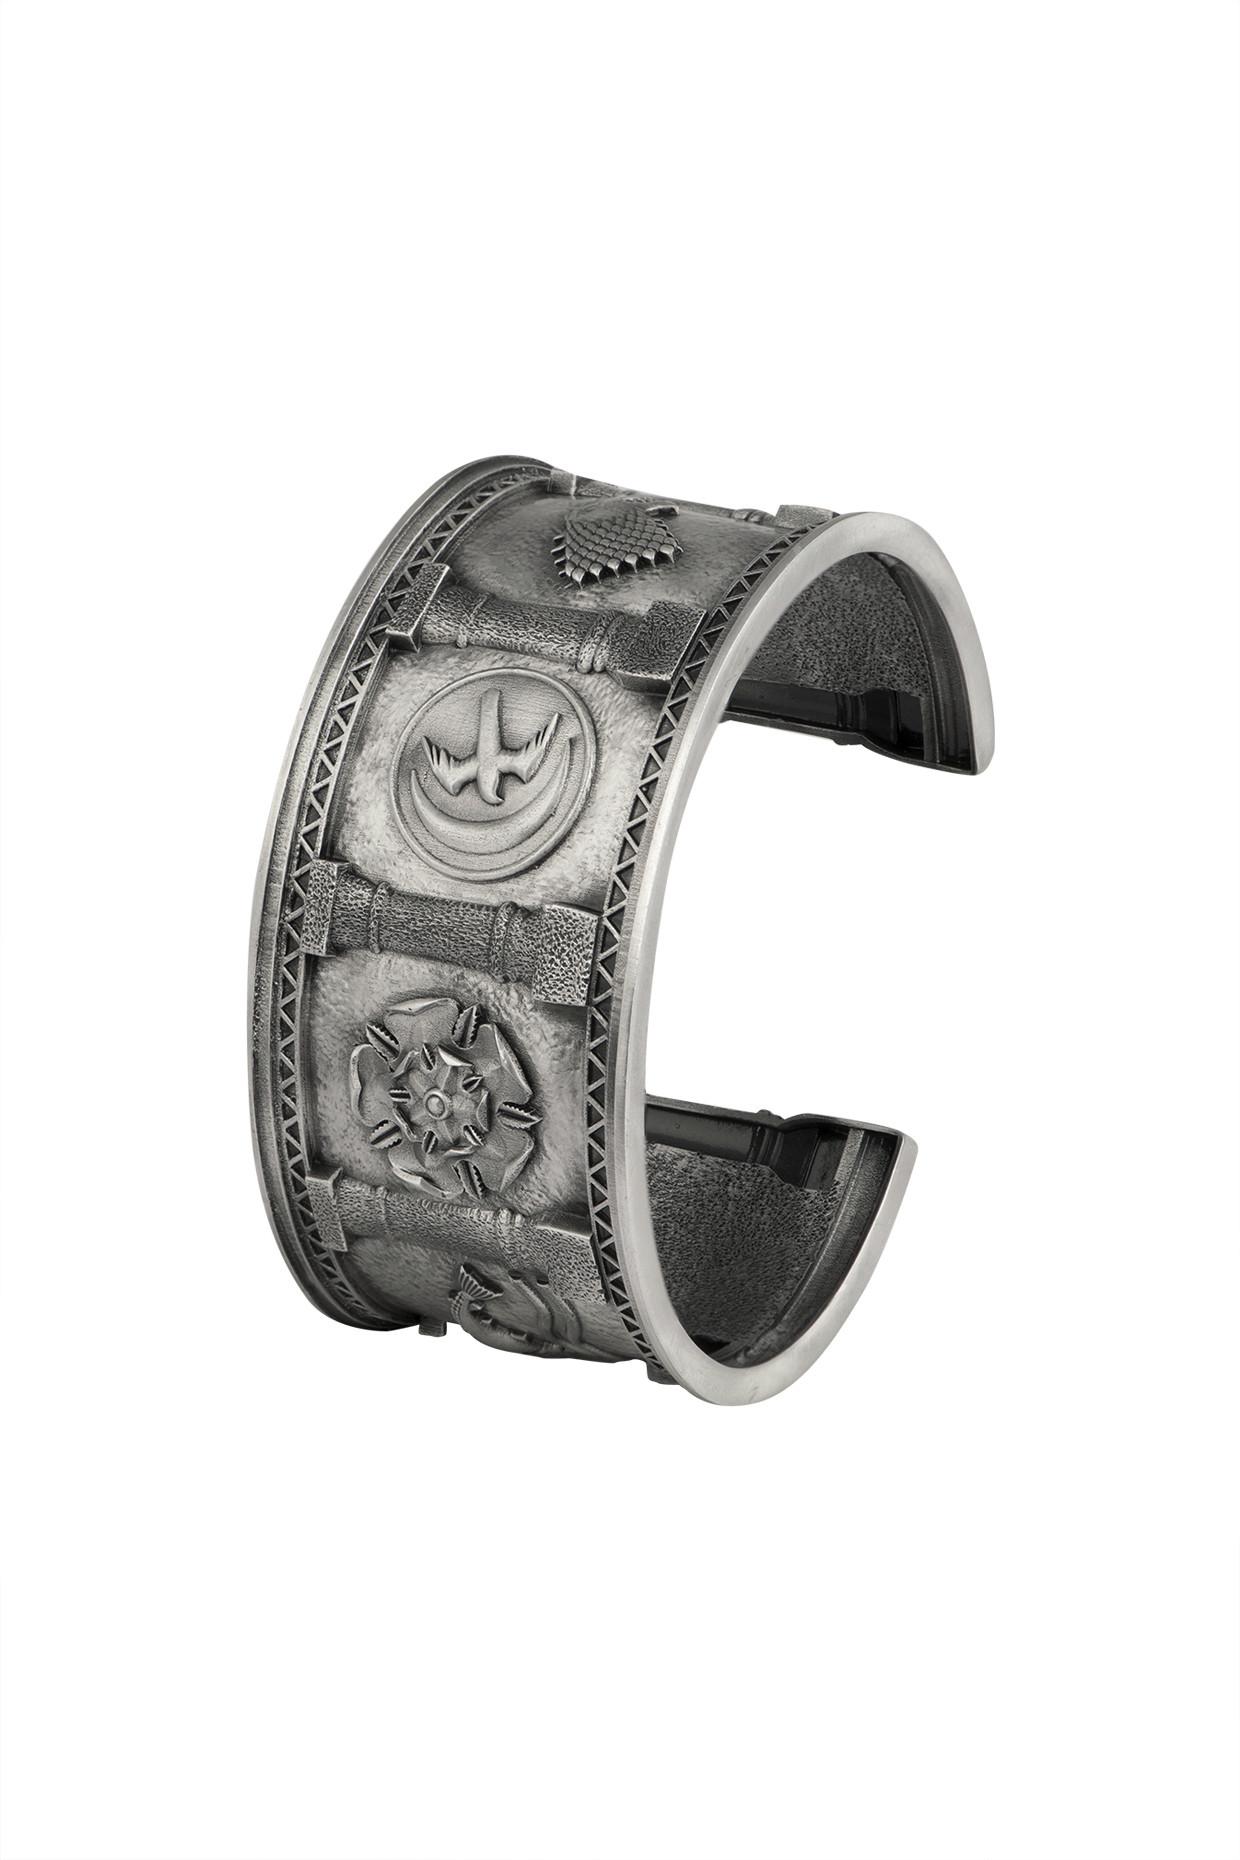 Silver Finish Sigil Storm Cuff by Masaba Jewellery